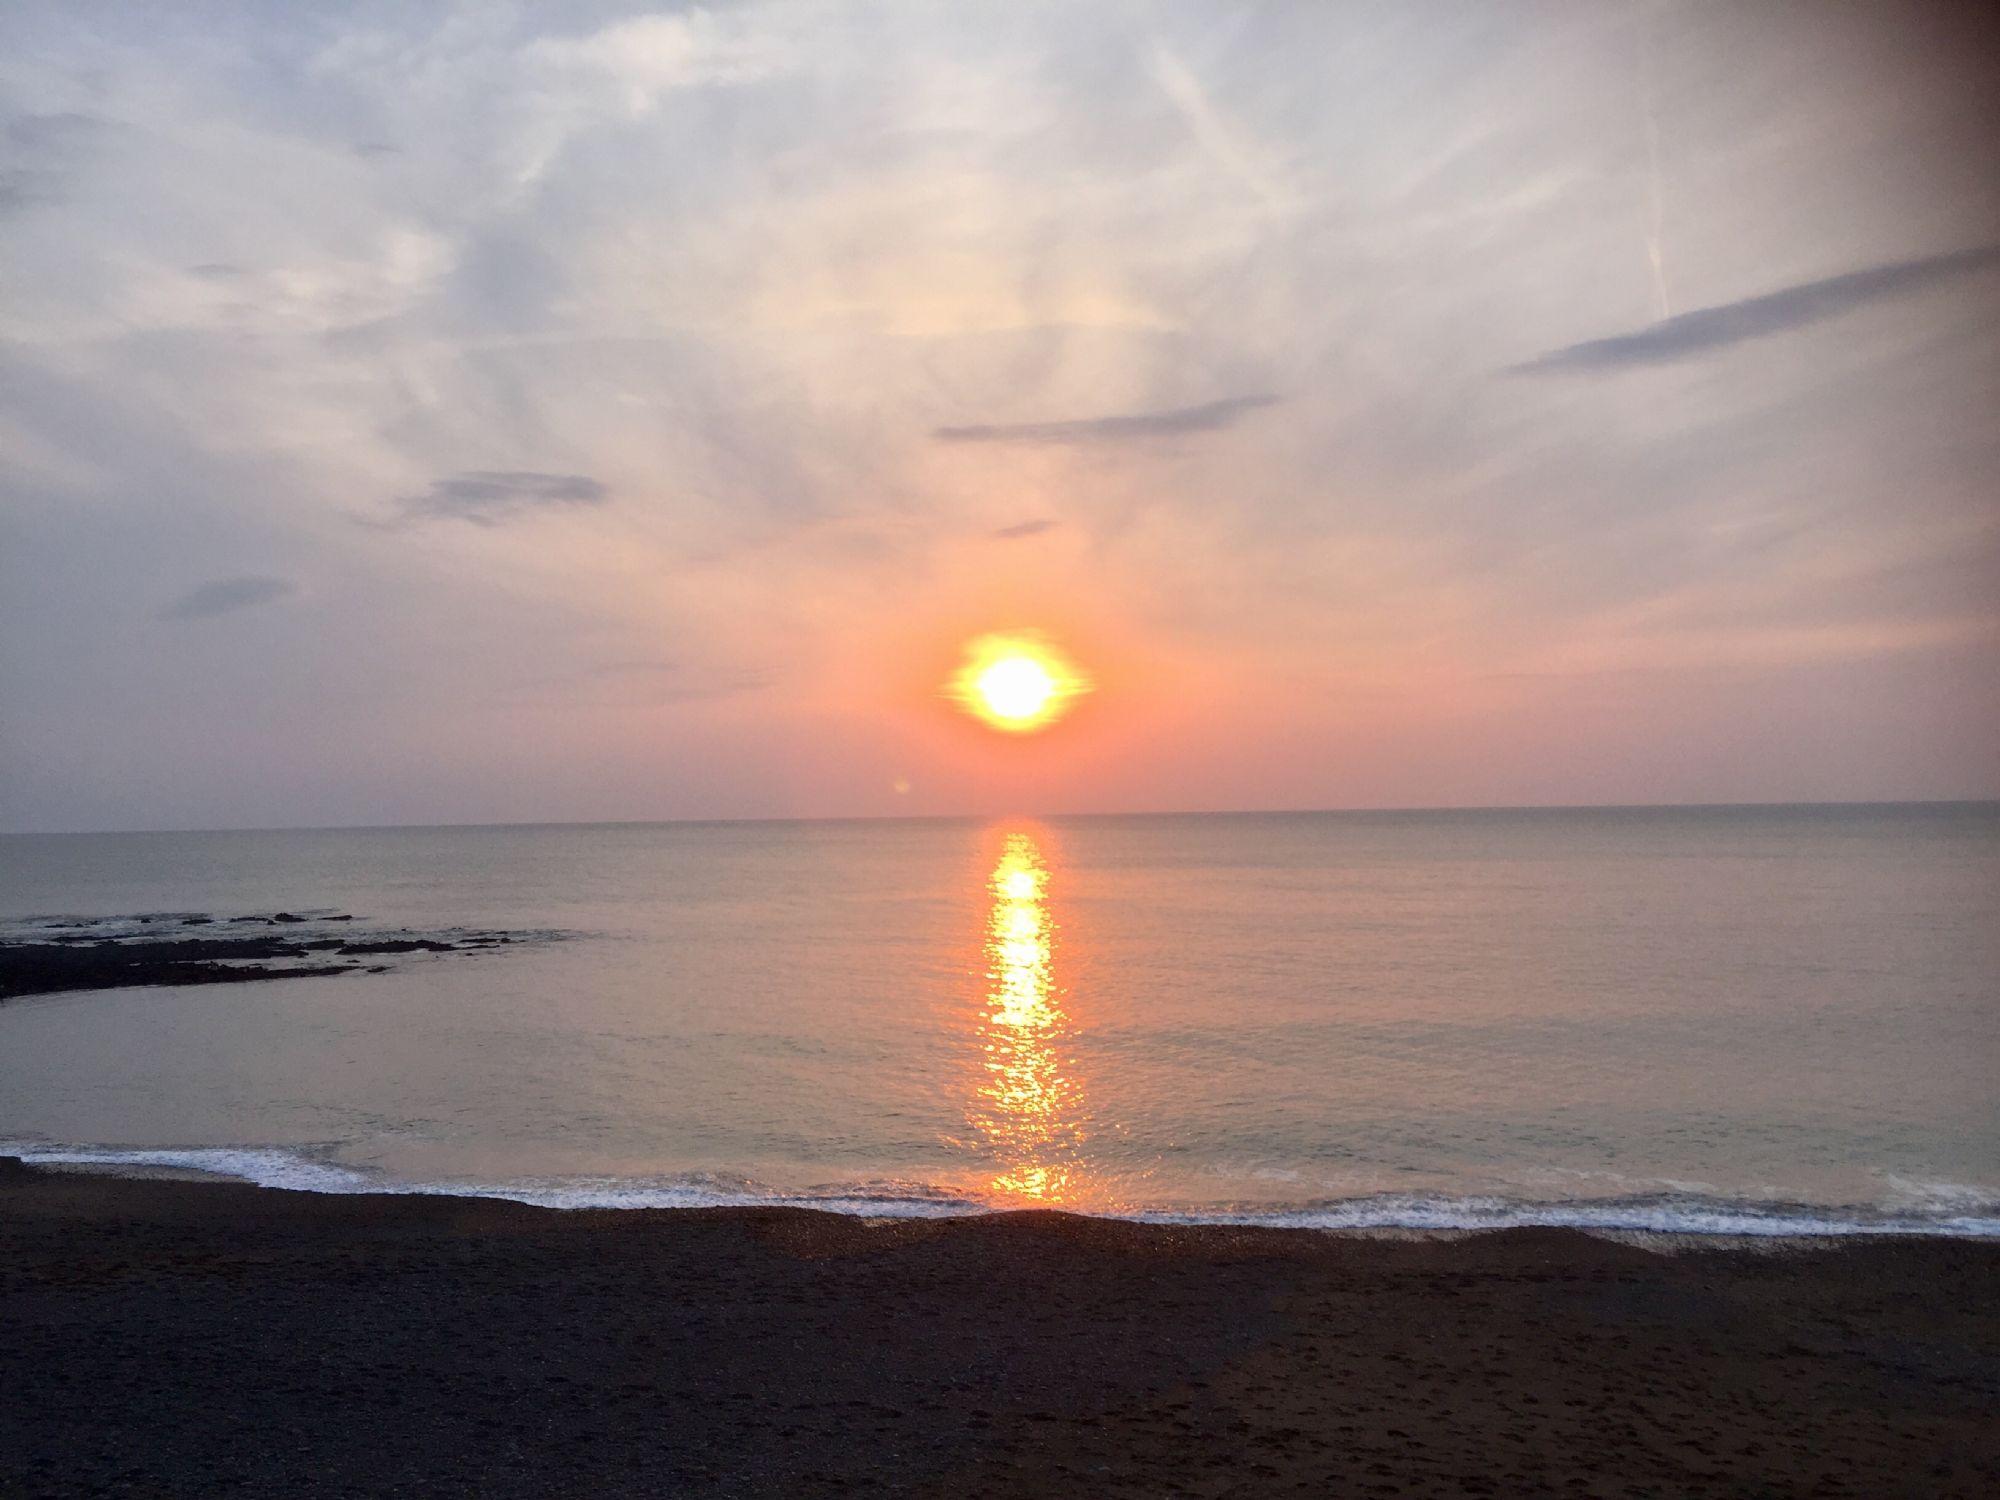 Sunset at Aberystwyth